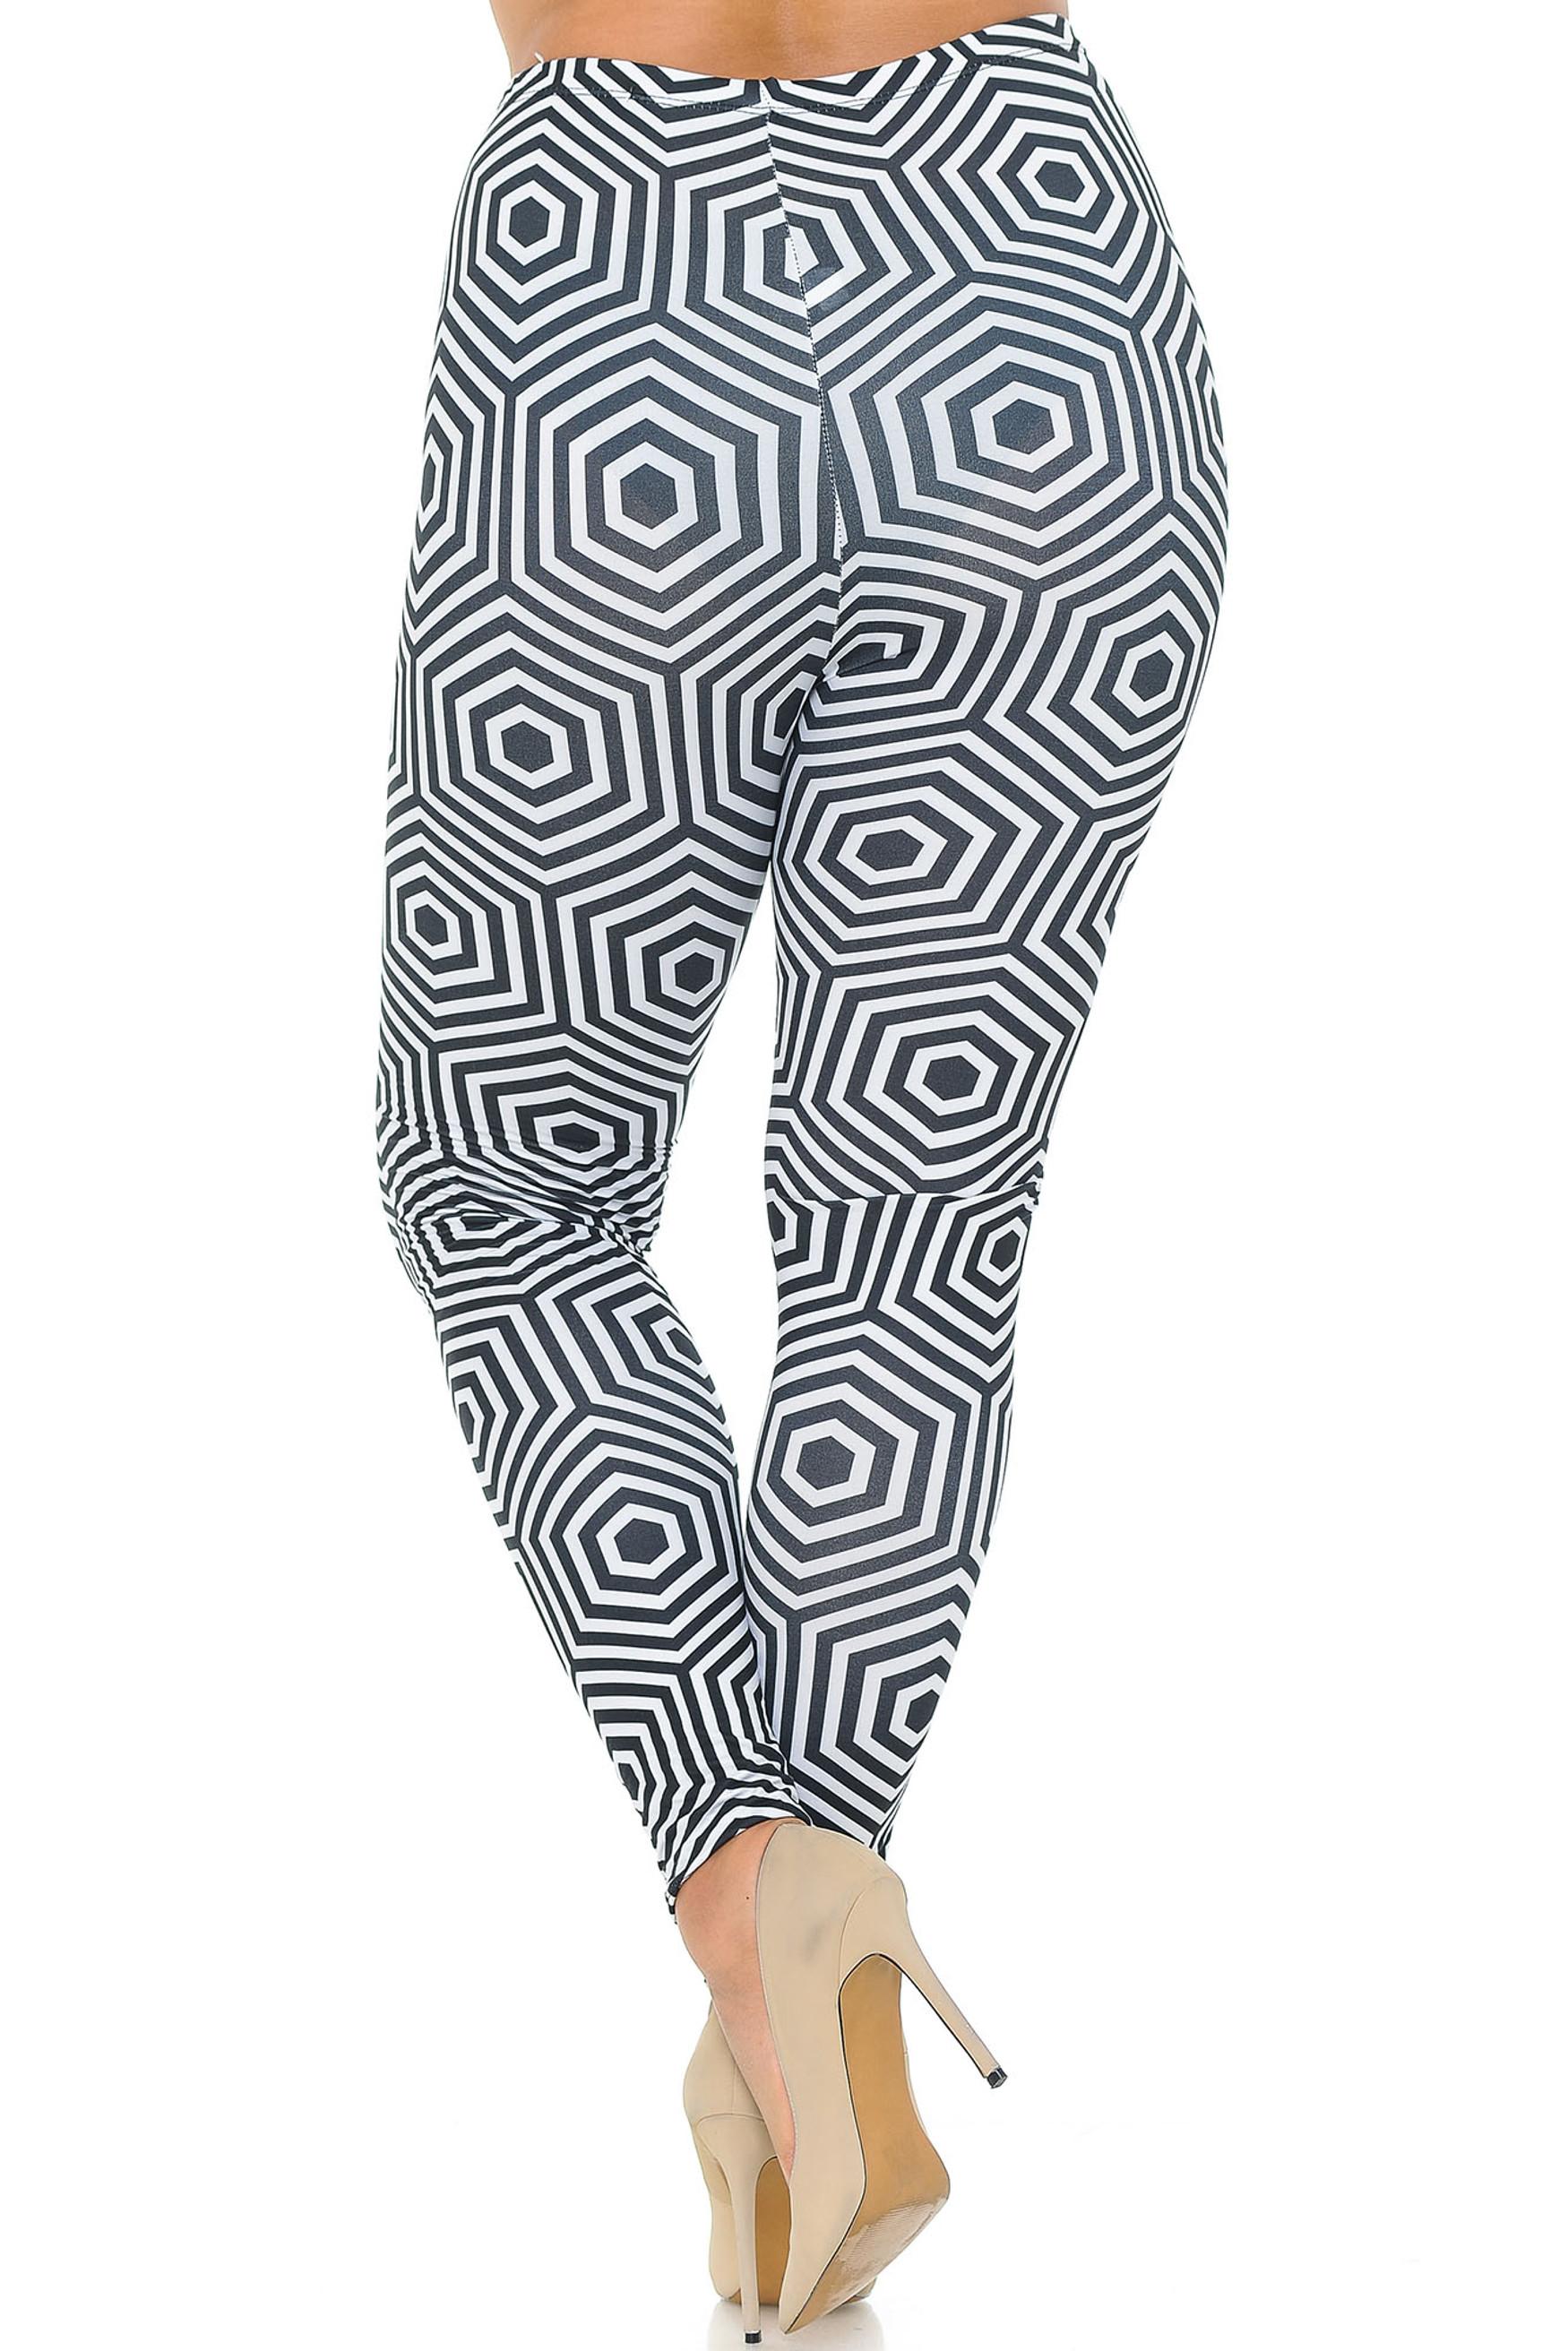 Double Brushed Hexagon Illusion Plus Size Leggings